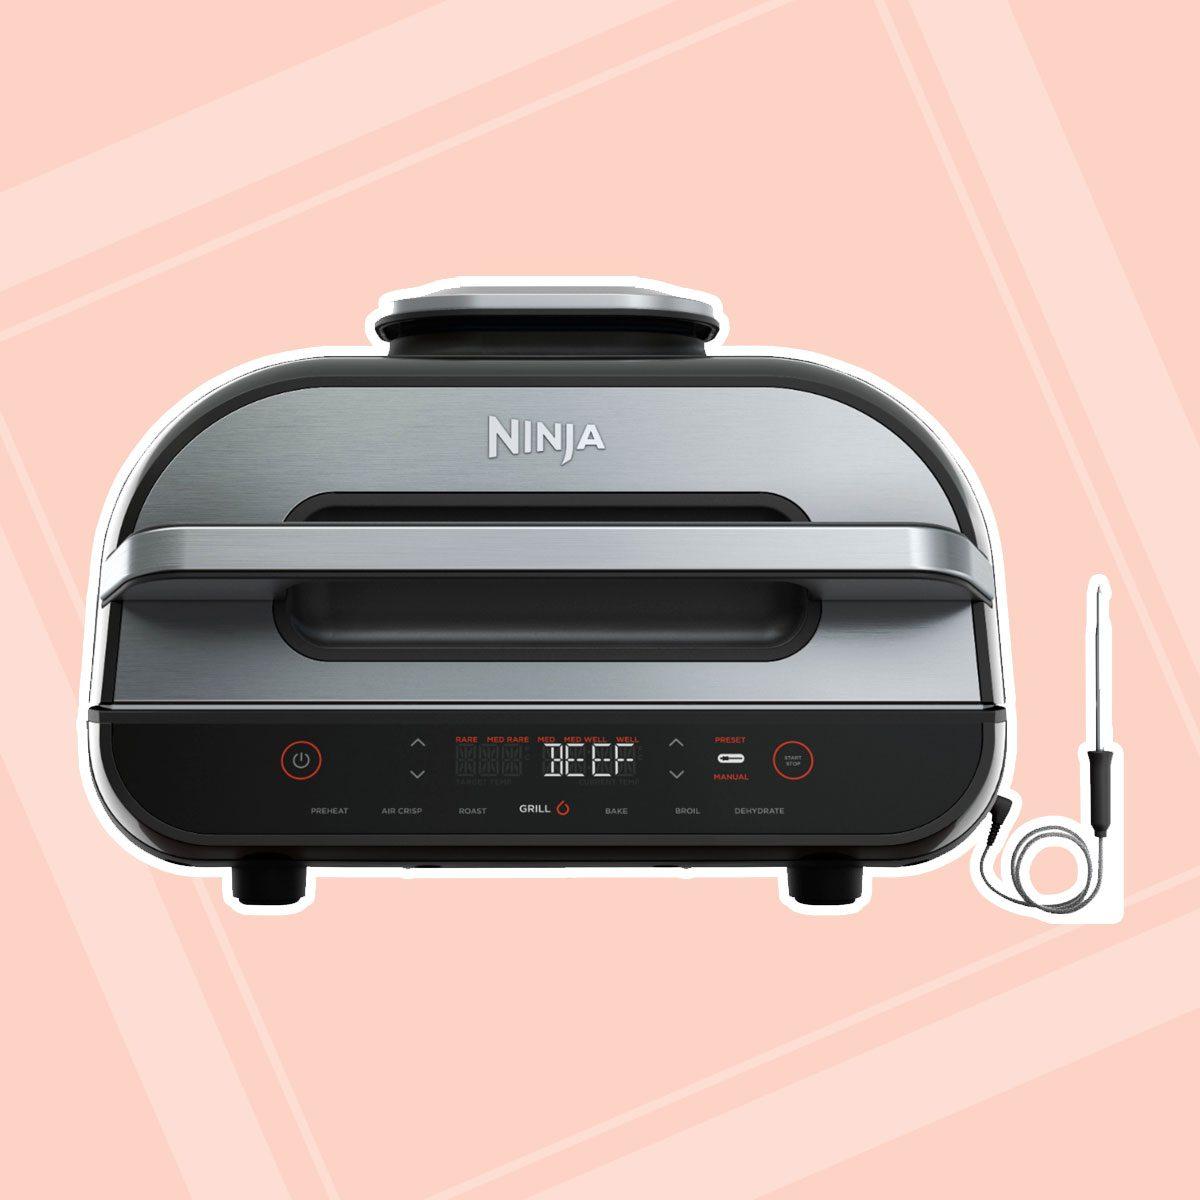 Ninja - Ninja® Foodi™ Smart XL 6-in-1 Indoor Grill with 4-qt Air Fryer, Roast, Bake, Broil, & Dehydrate - Black